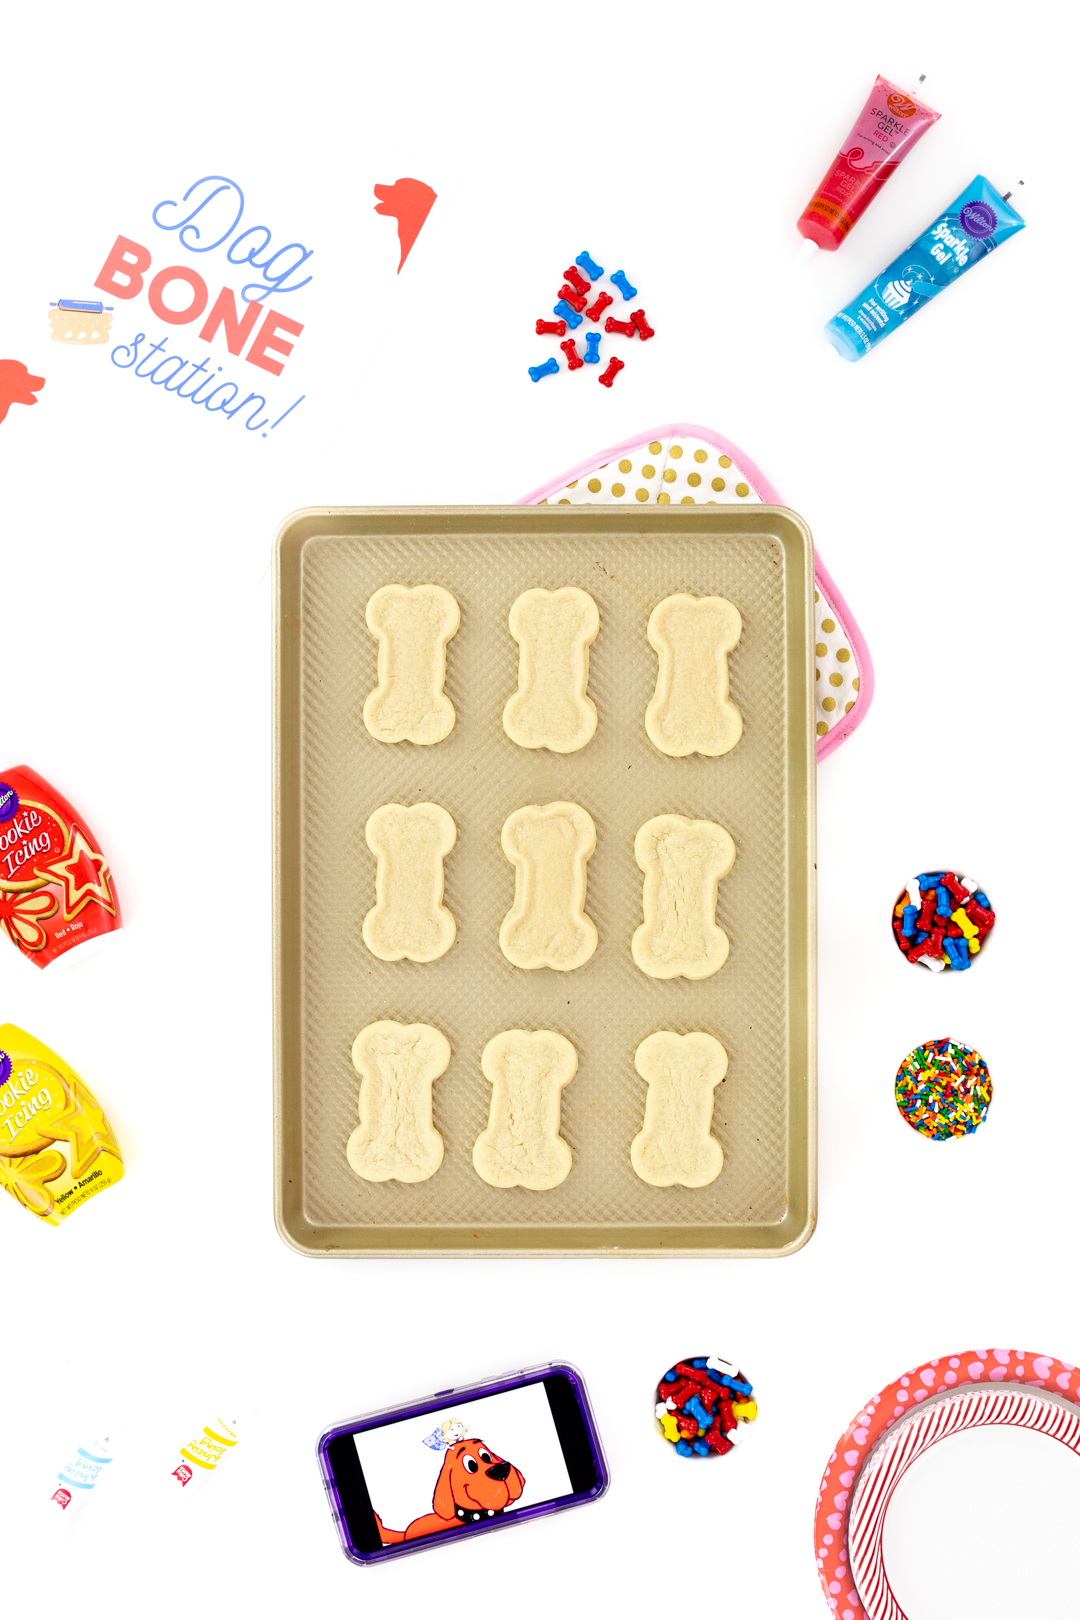 tray of dog bone cookies